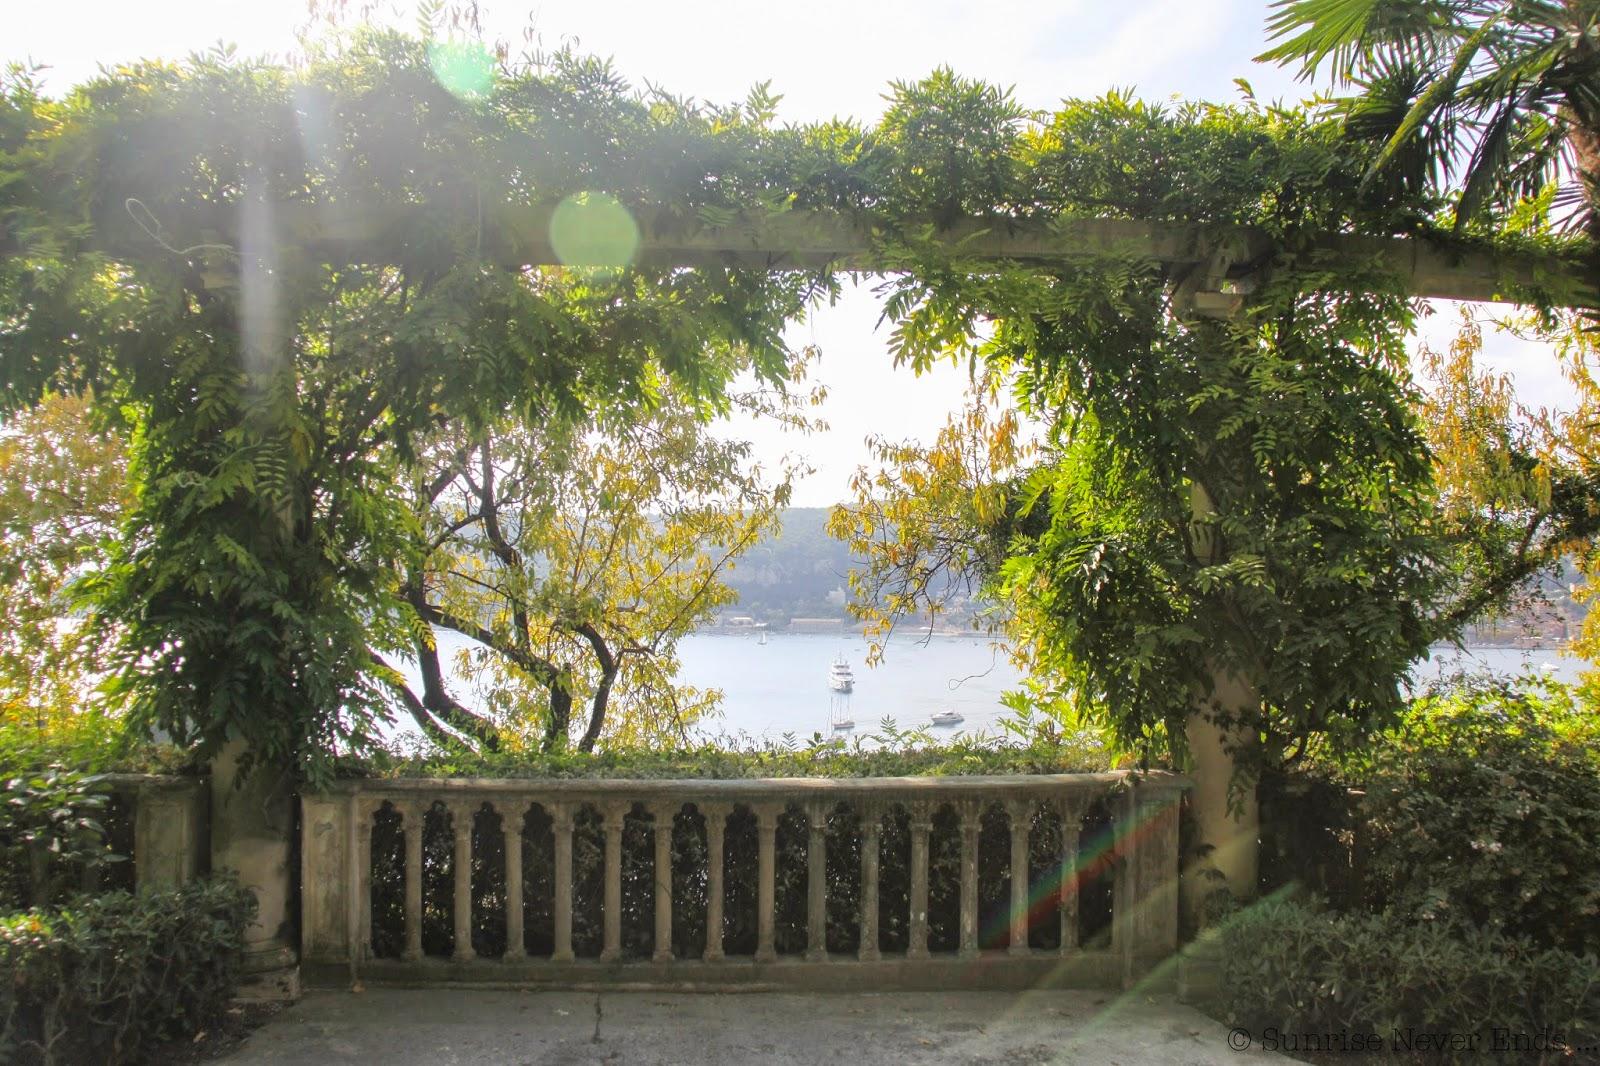 villa ephrussi de rothschild,saint jean cap ferrat, jardin espagnol,terre cuite,tropical,hibiscus,hello riviera